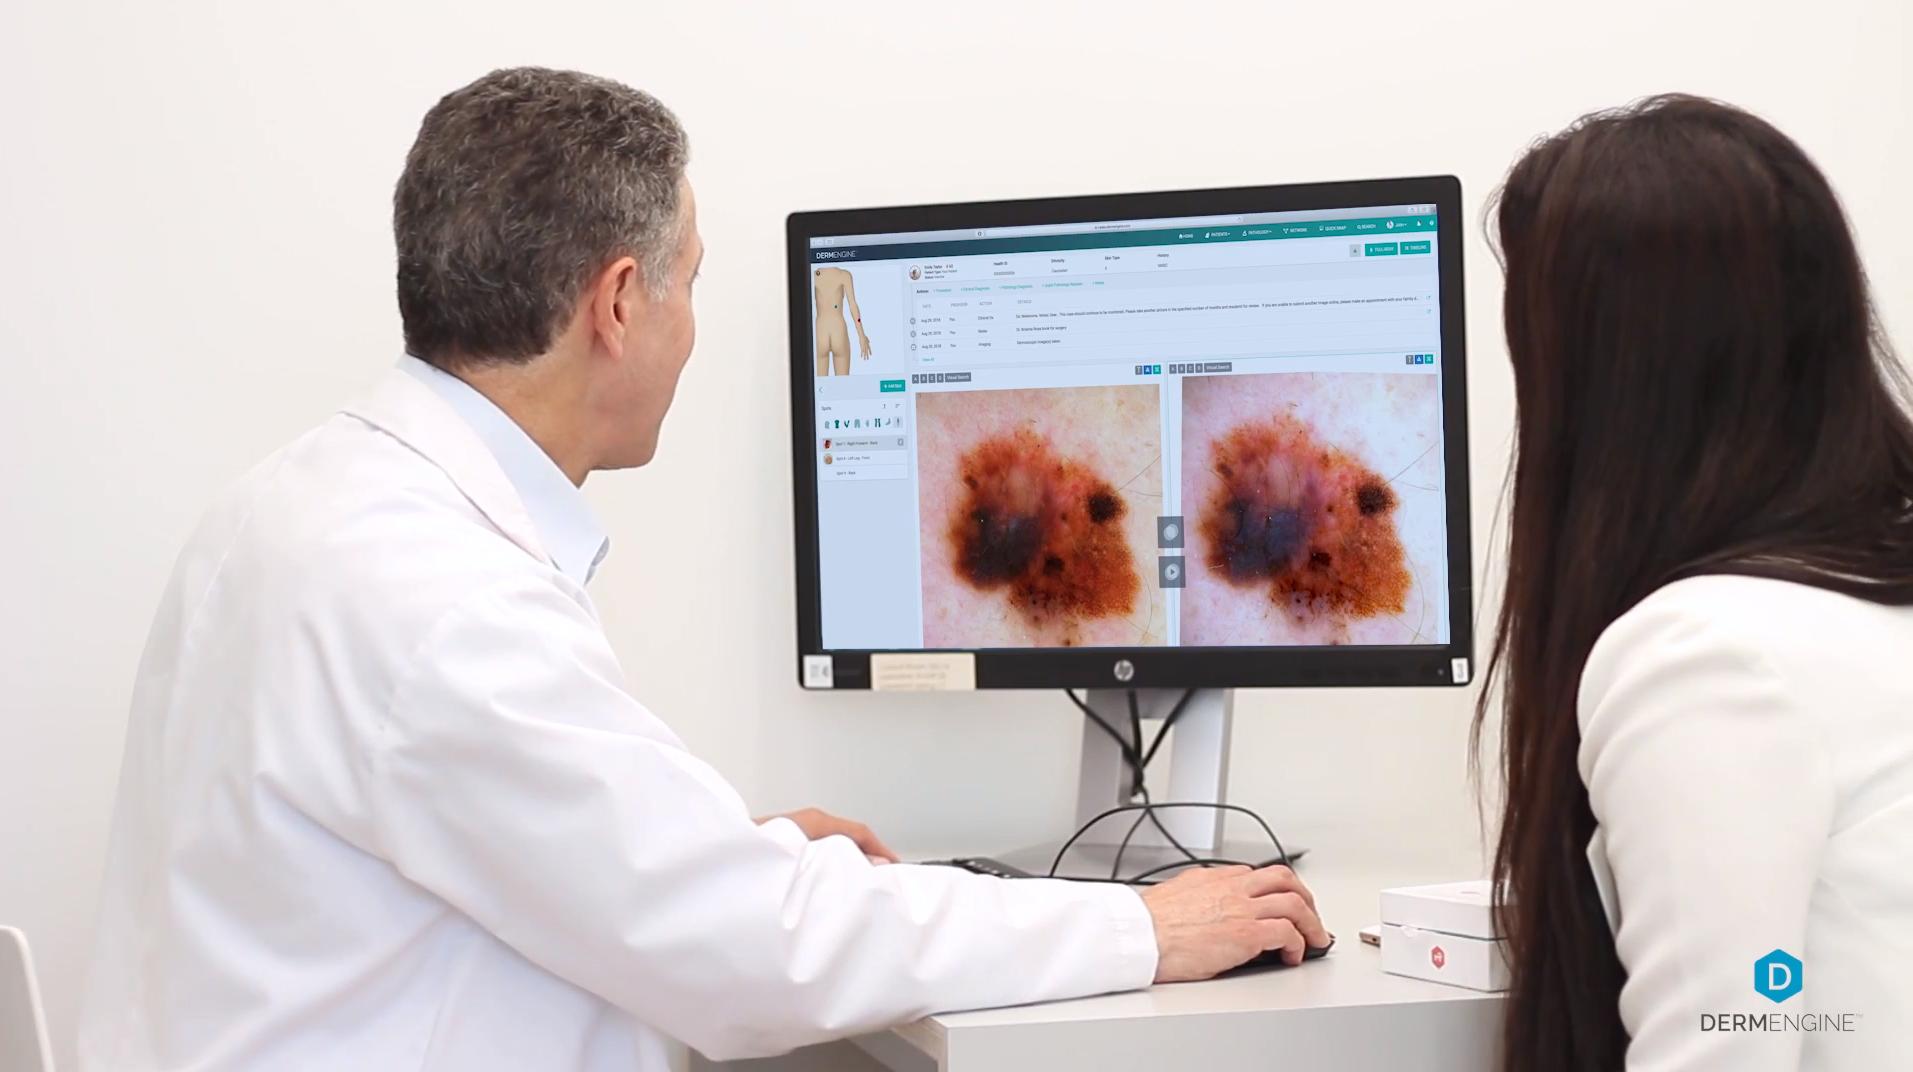 Dermatologists Reviewing Skin Lesions With DermEngine's Intelligent Dermatology Algorithms